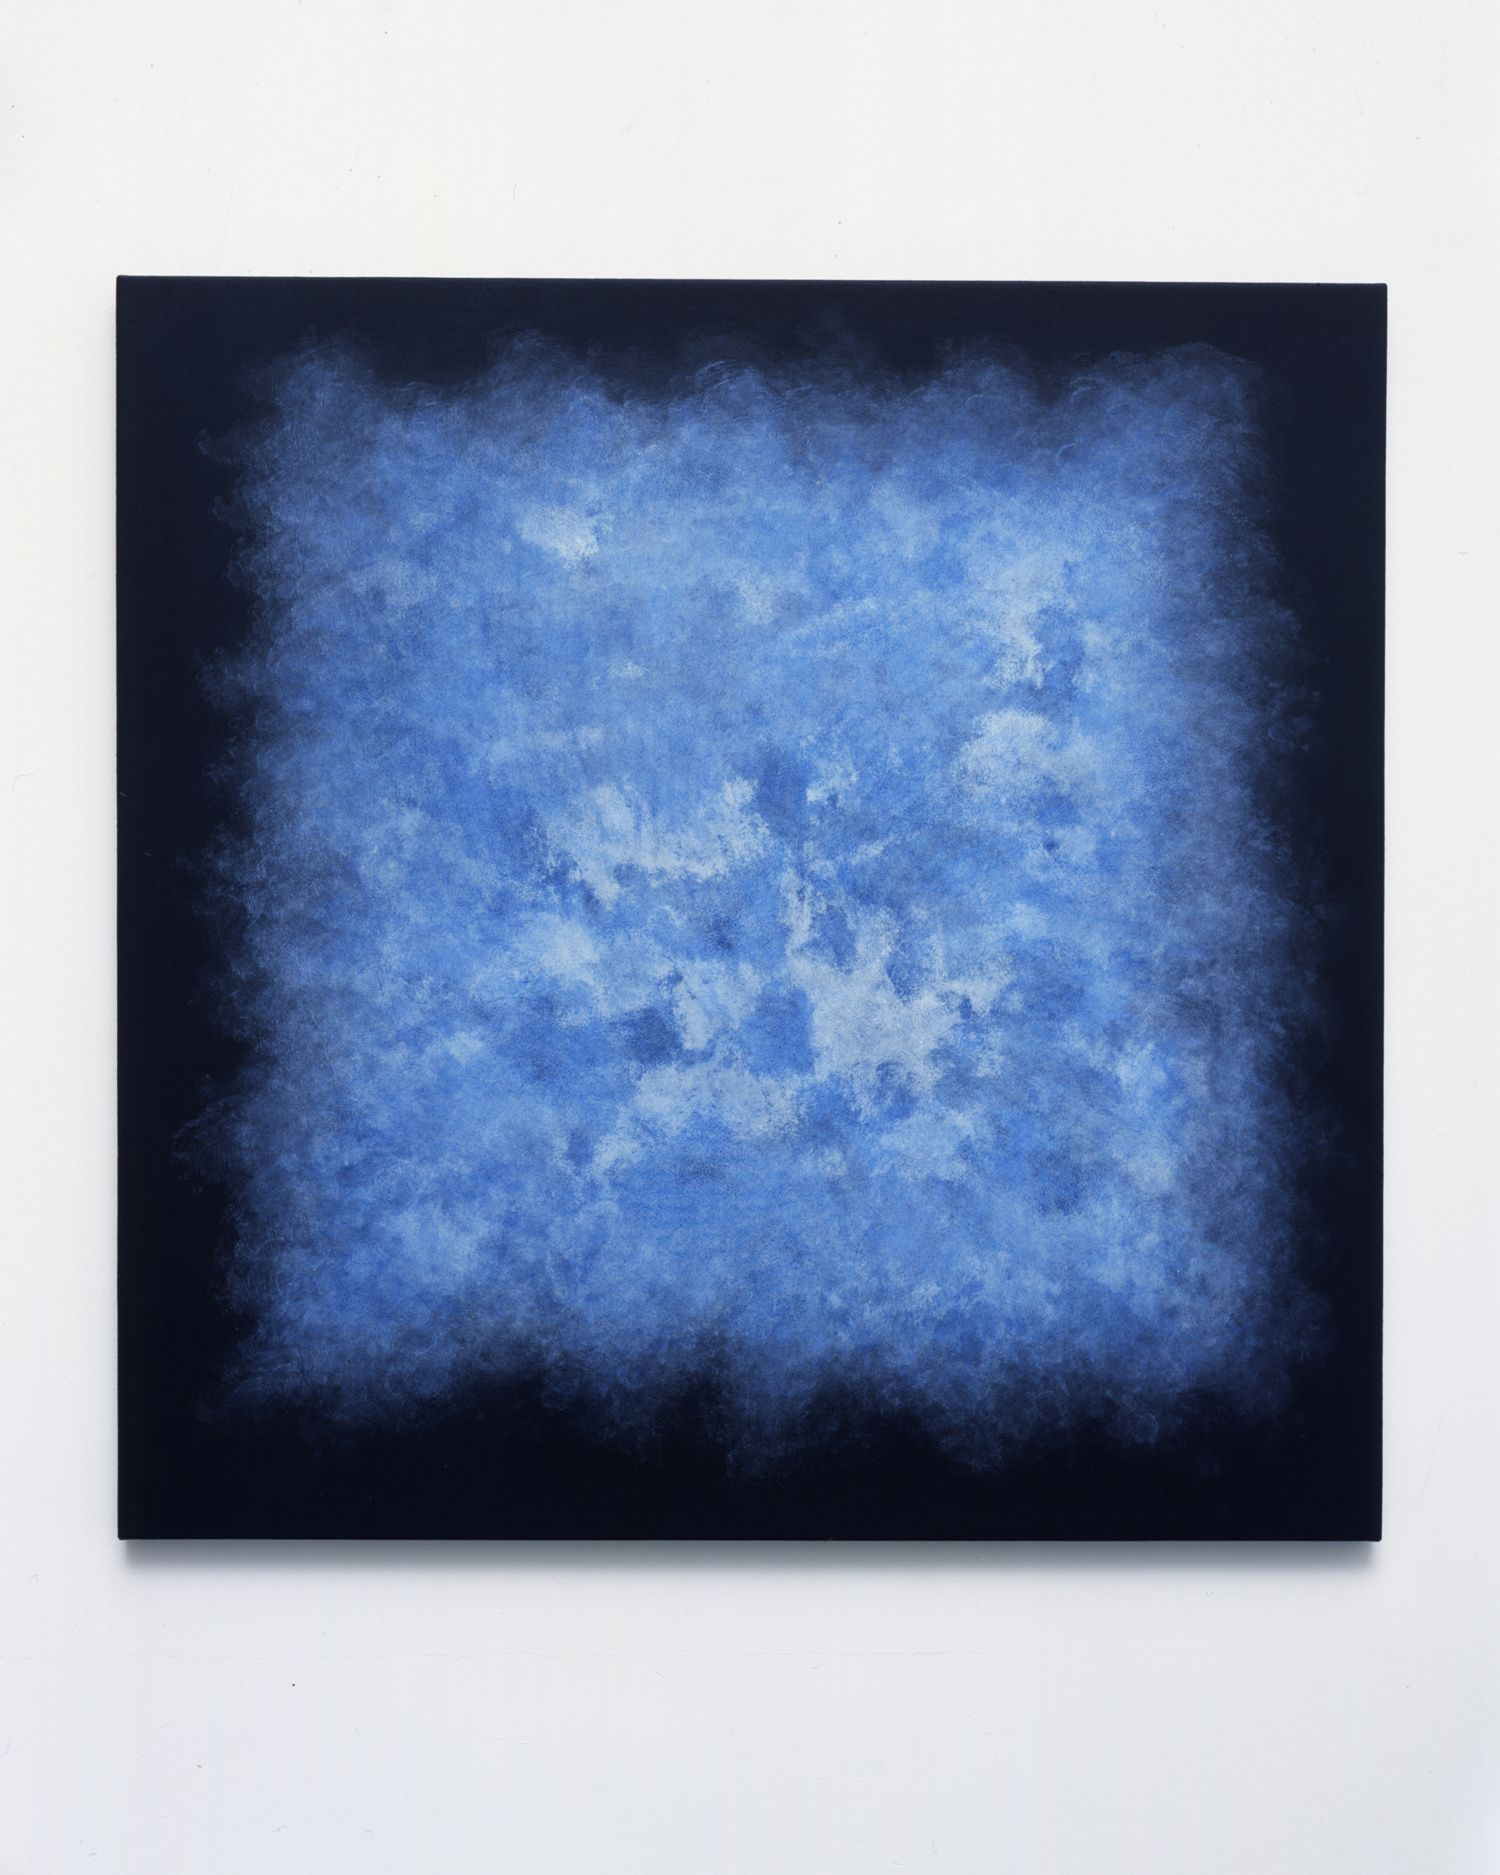 Shirazeh Houshiary Quiver, 2008 Blue pencil on black aquacryl on canvas  70 x 70 cm / 27 5/8 x 27 5/8 in. | Lisson Gallery